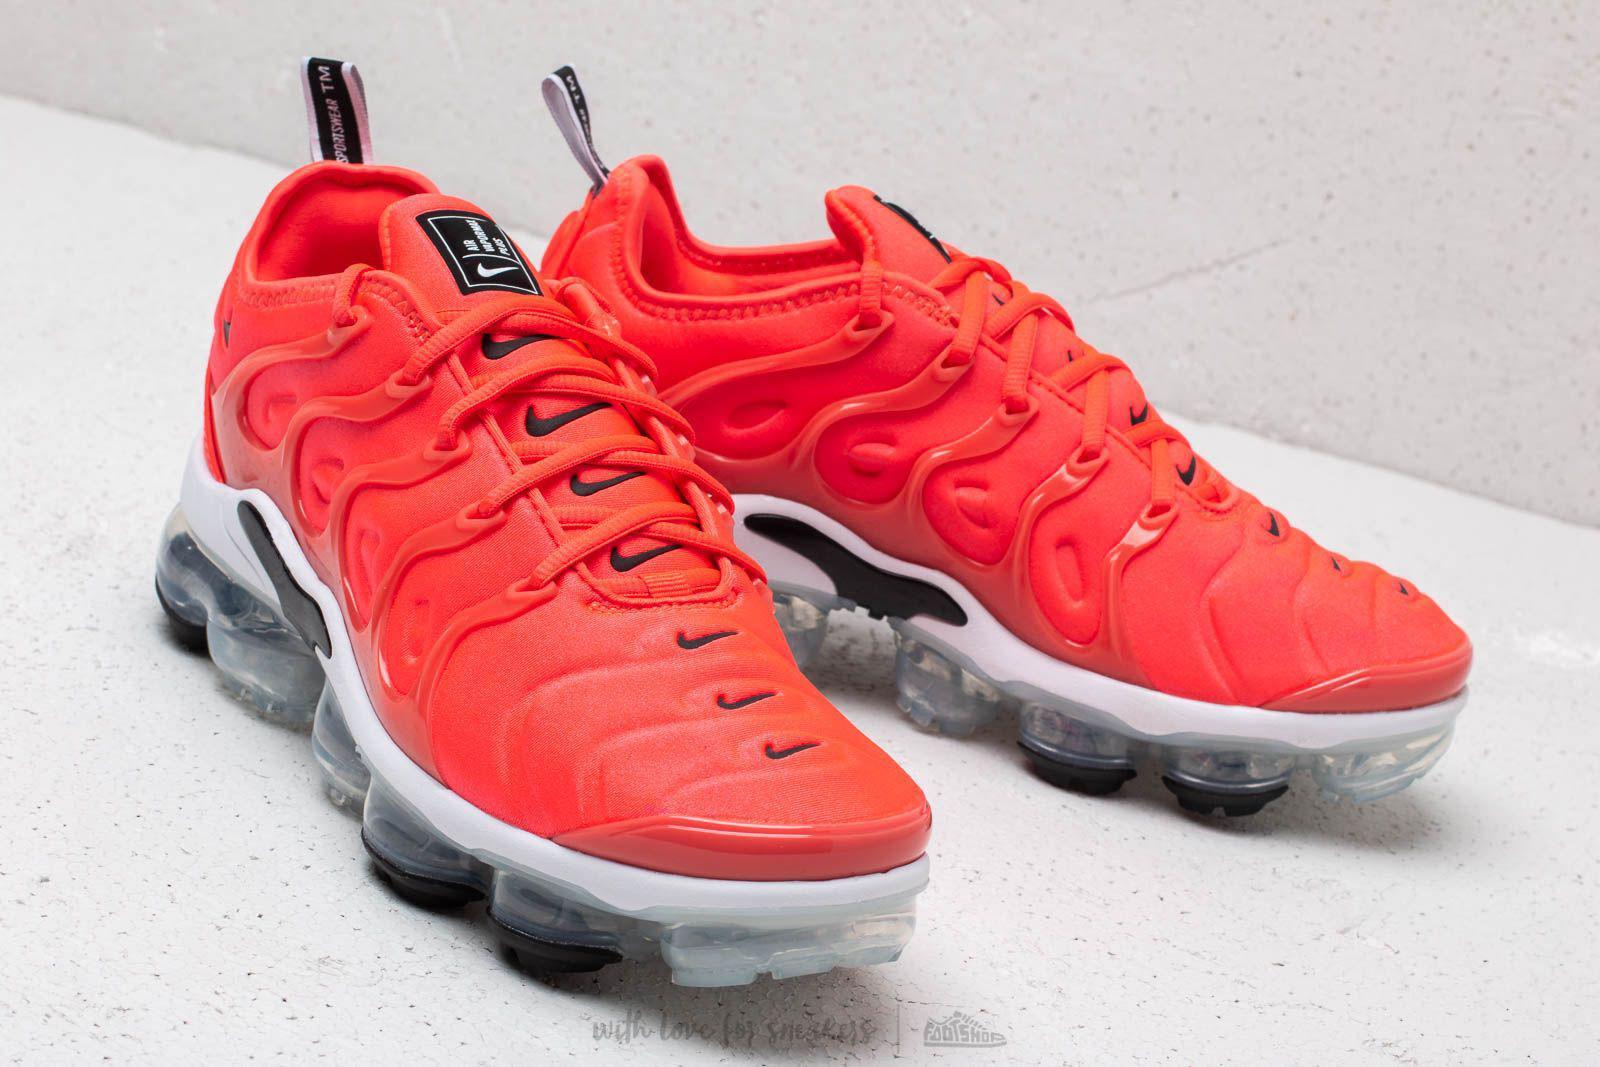 ab7db7b3b9fa Lyst - Nike Air Vapormax Plus Bright Crimson  Black-white in Red for Men